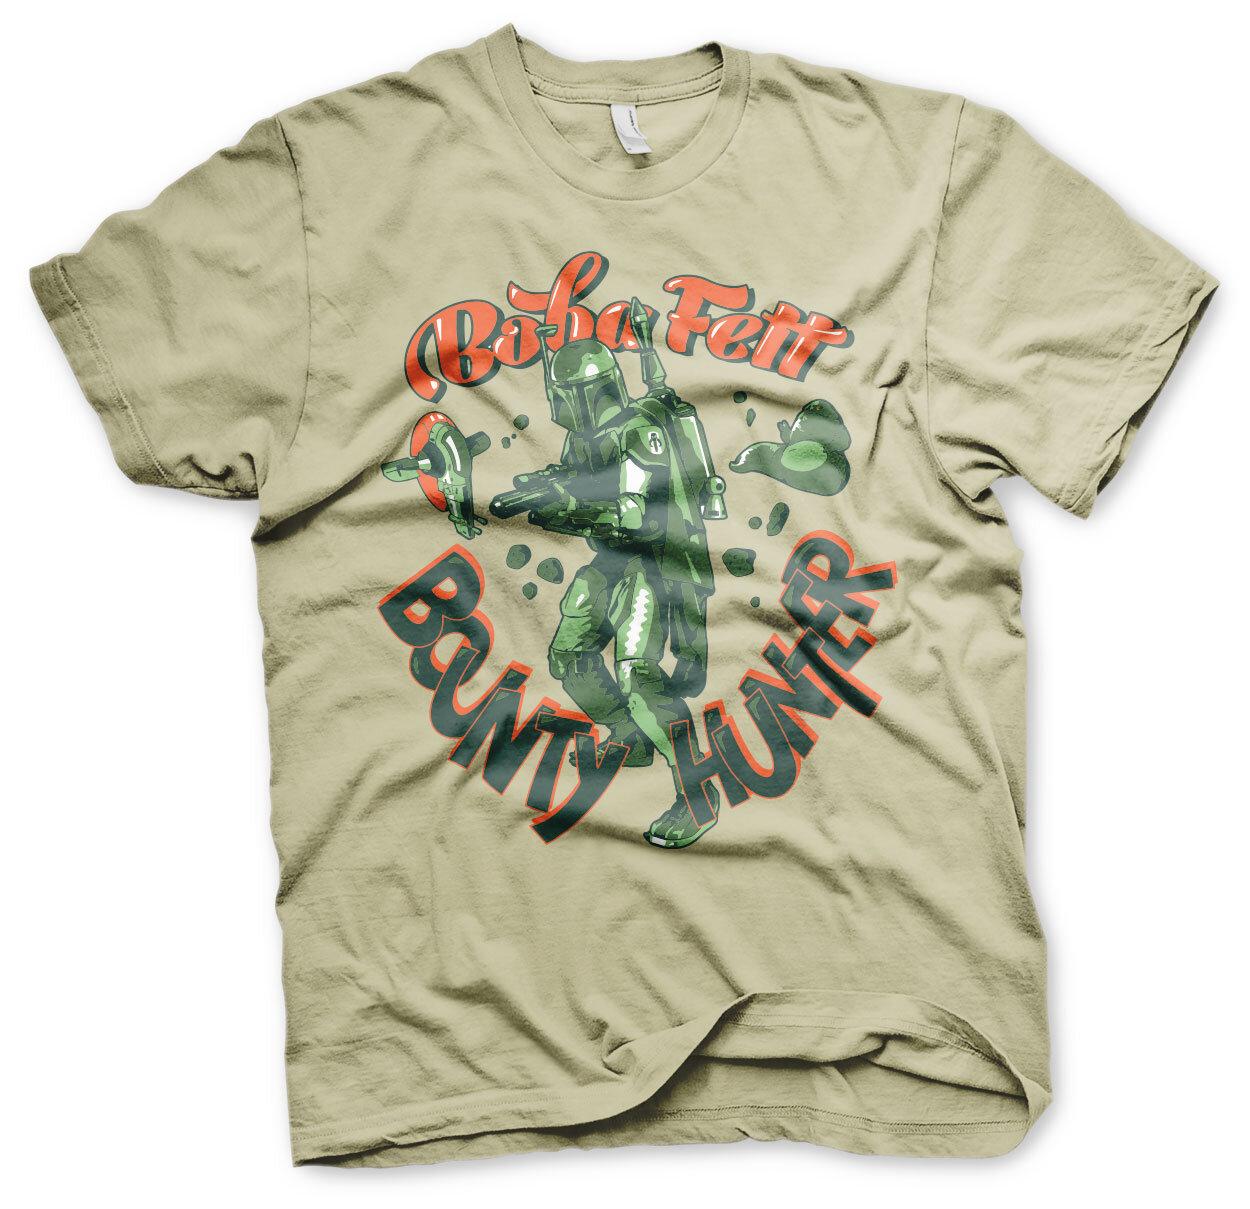 Star Wars - Boba Fett T-Shirt